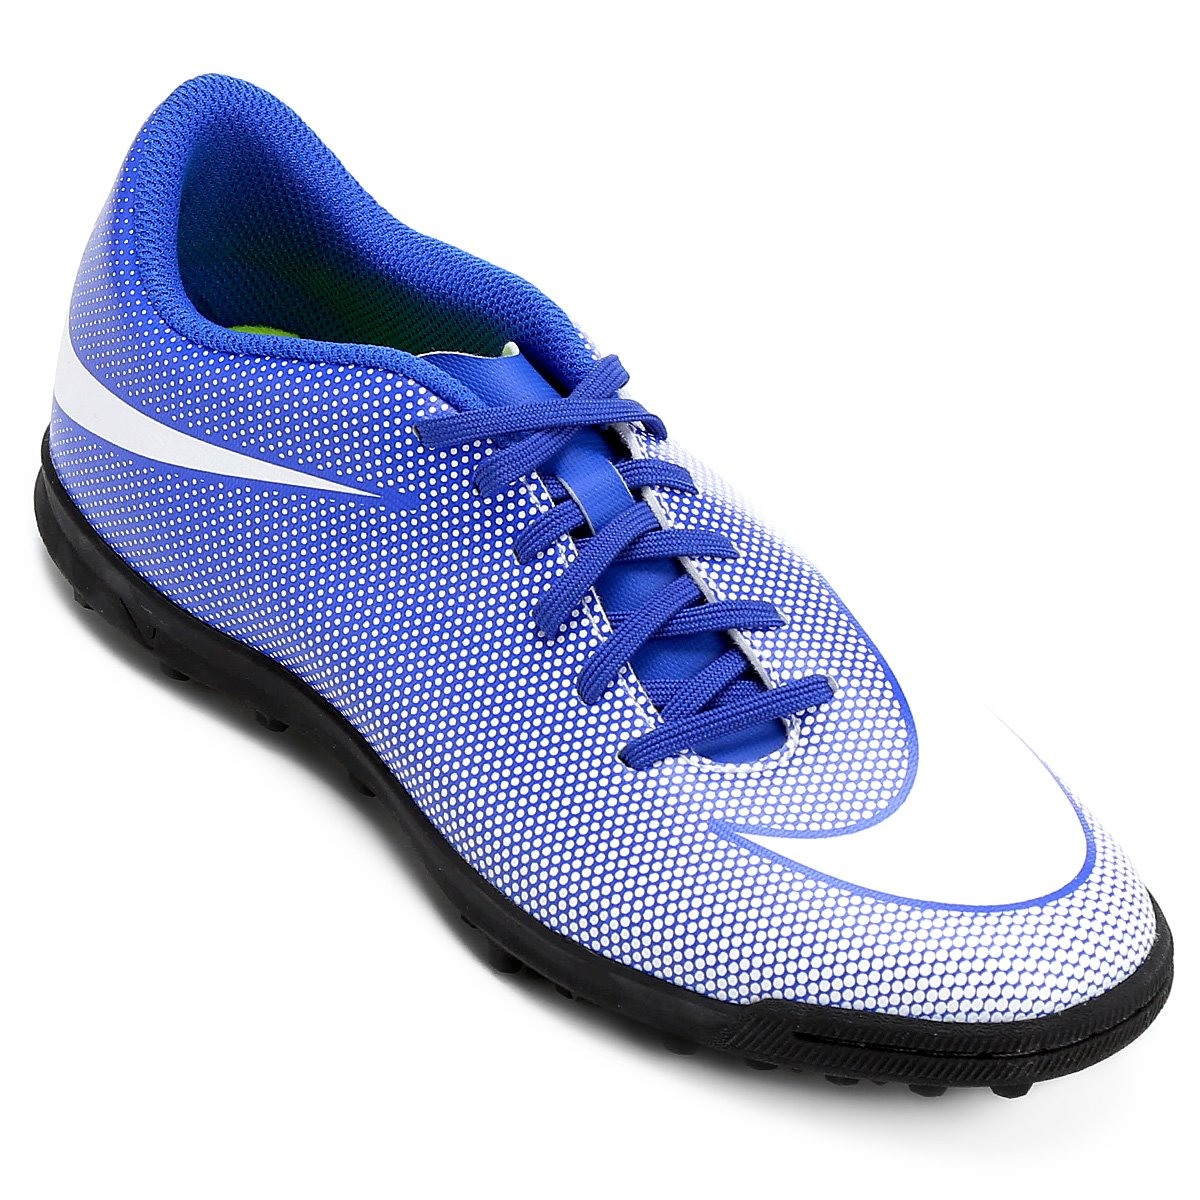 c0e6e13306 Chuteira Society Nike Bravata 2 TF - Azul e Branco